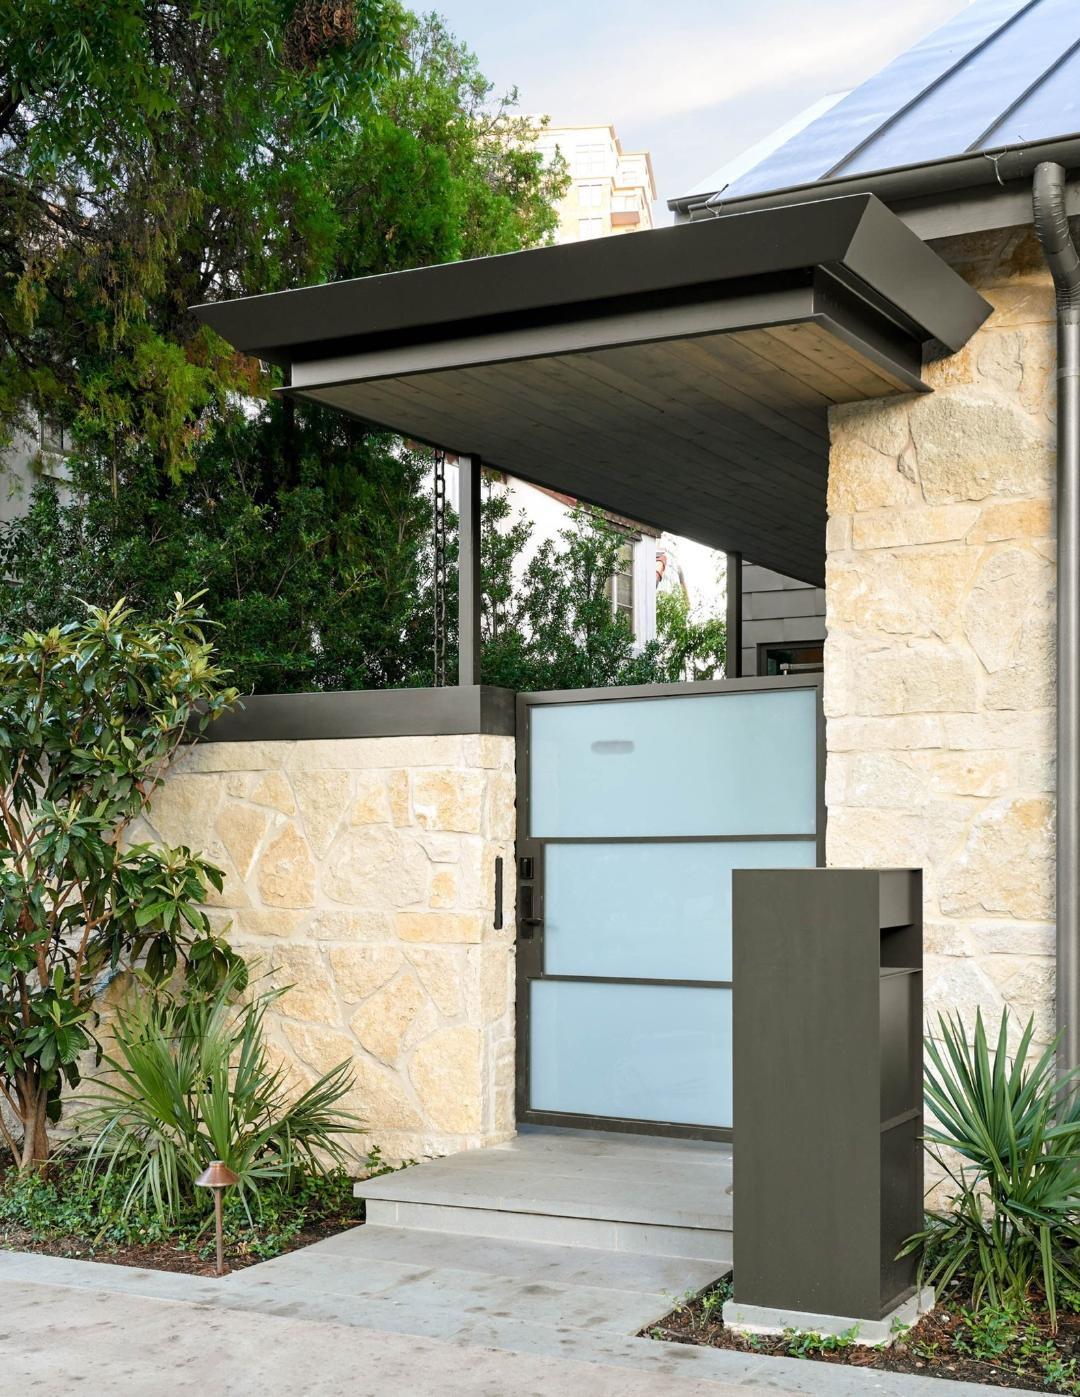 dallas-residential-architect, regional-texas-design, regional-modern-architect, gates-wall-modern-deisgn, modern-home-design